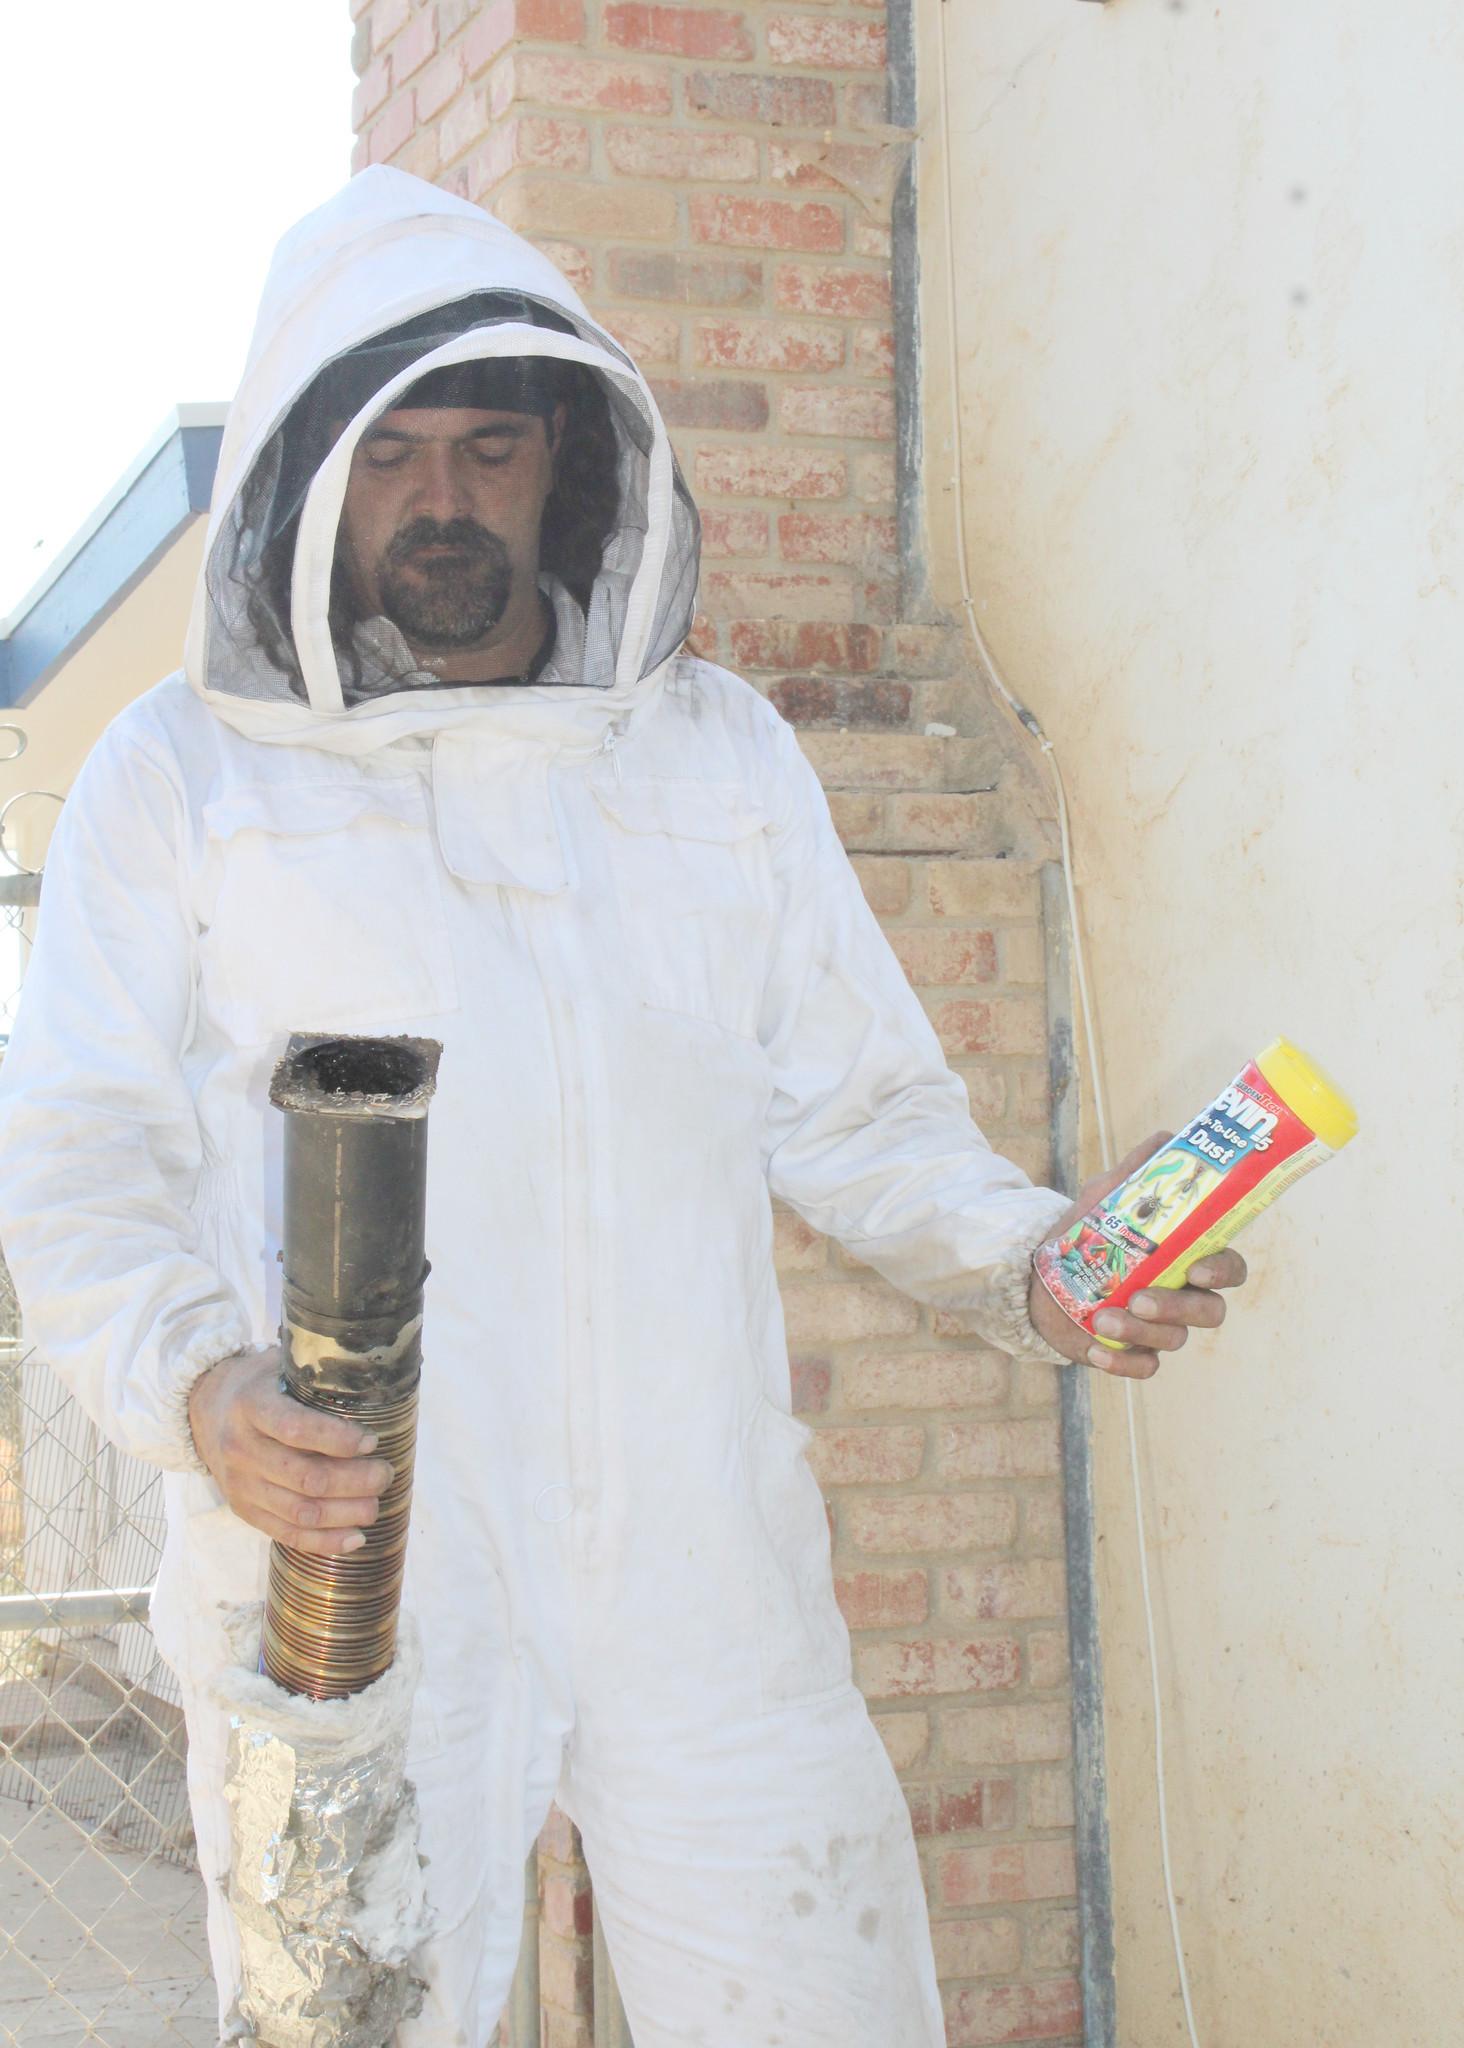 bees u0027set up shop u0027 in chimney ramona sentinel